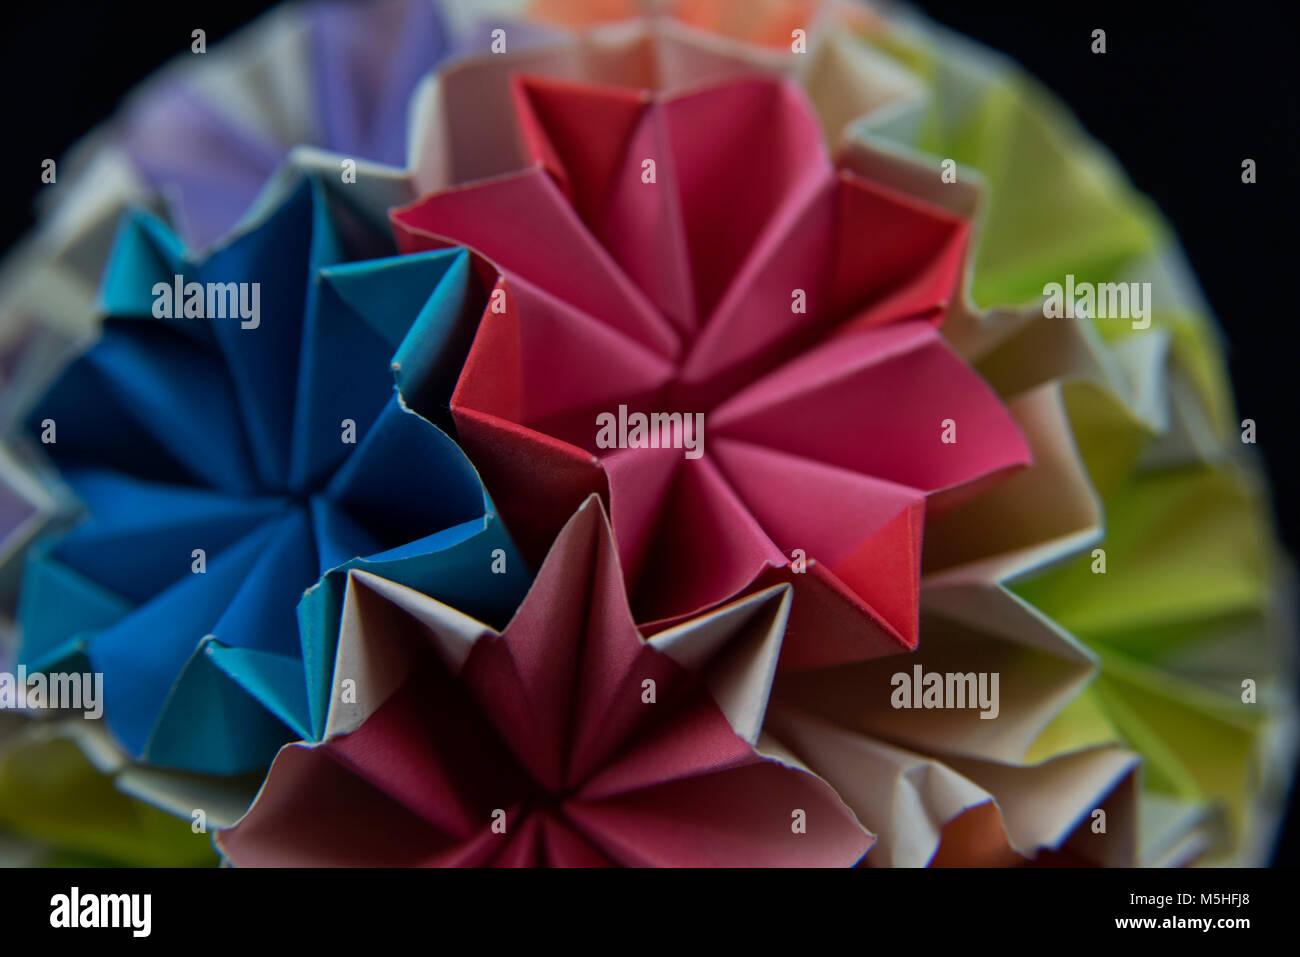 Origami ball cerrar Imagen De Stock